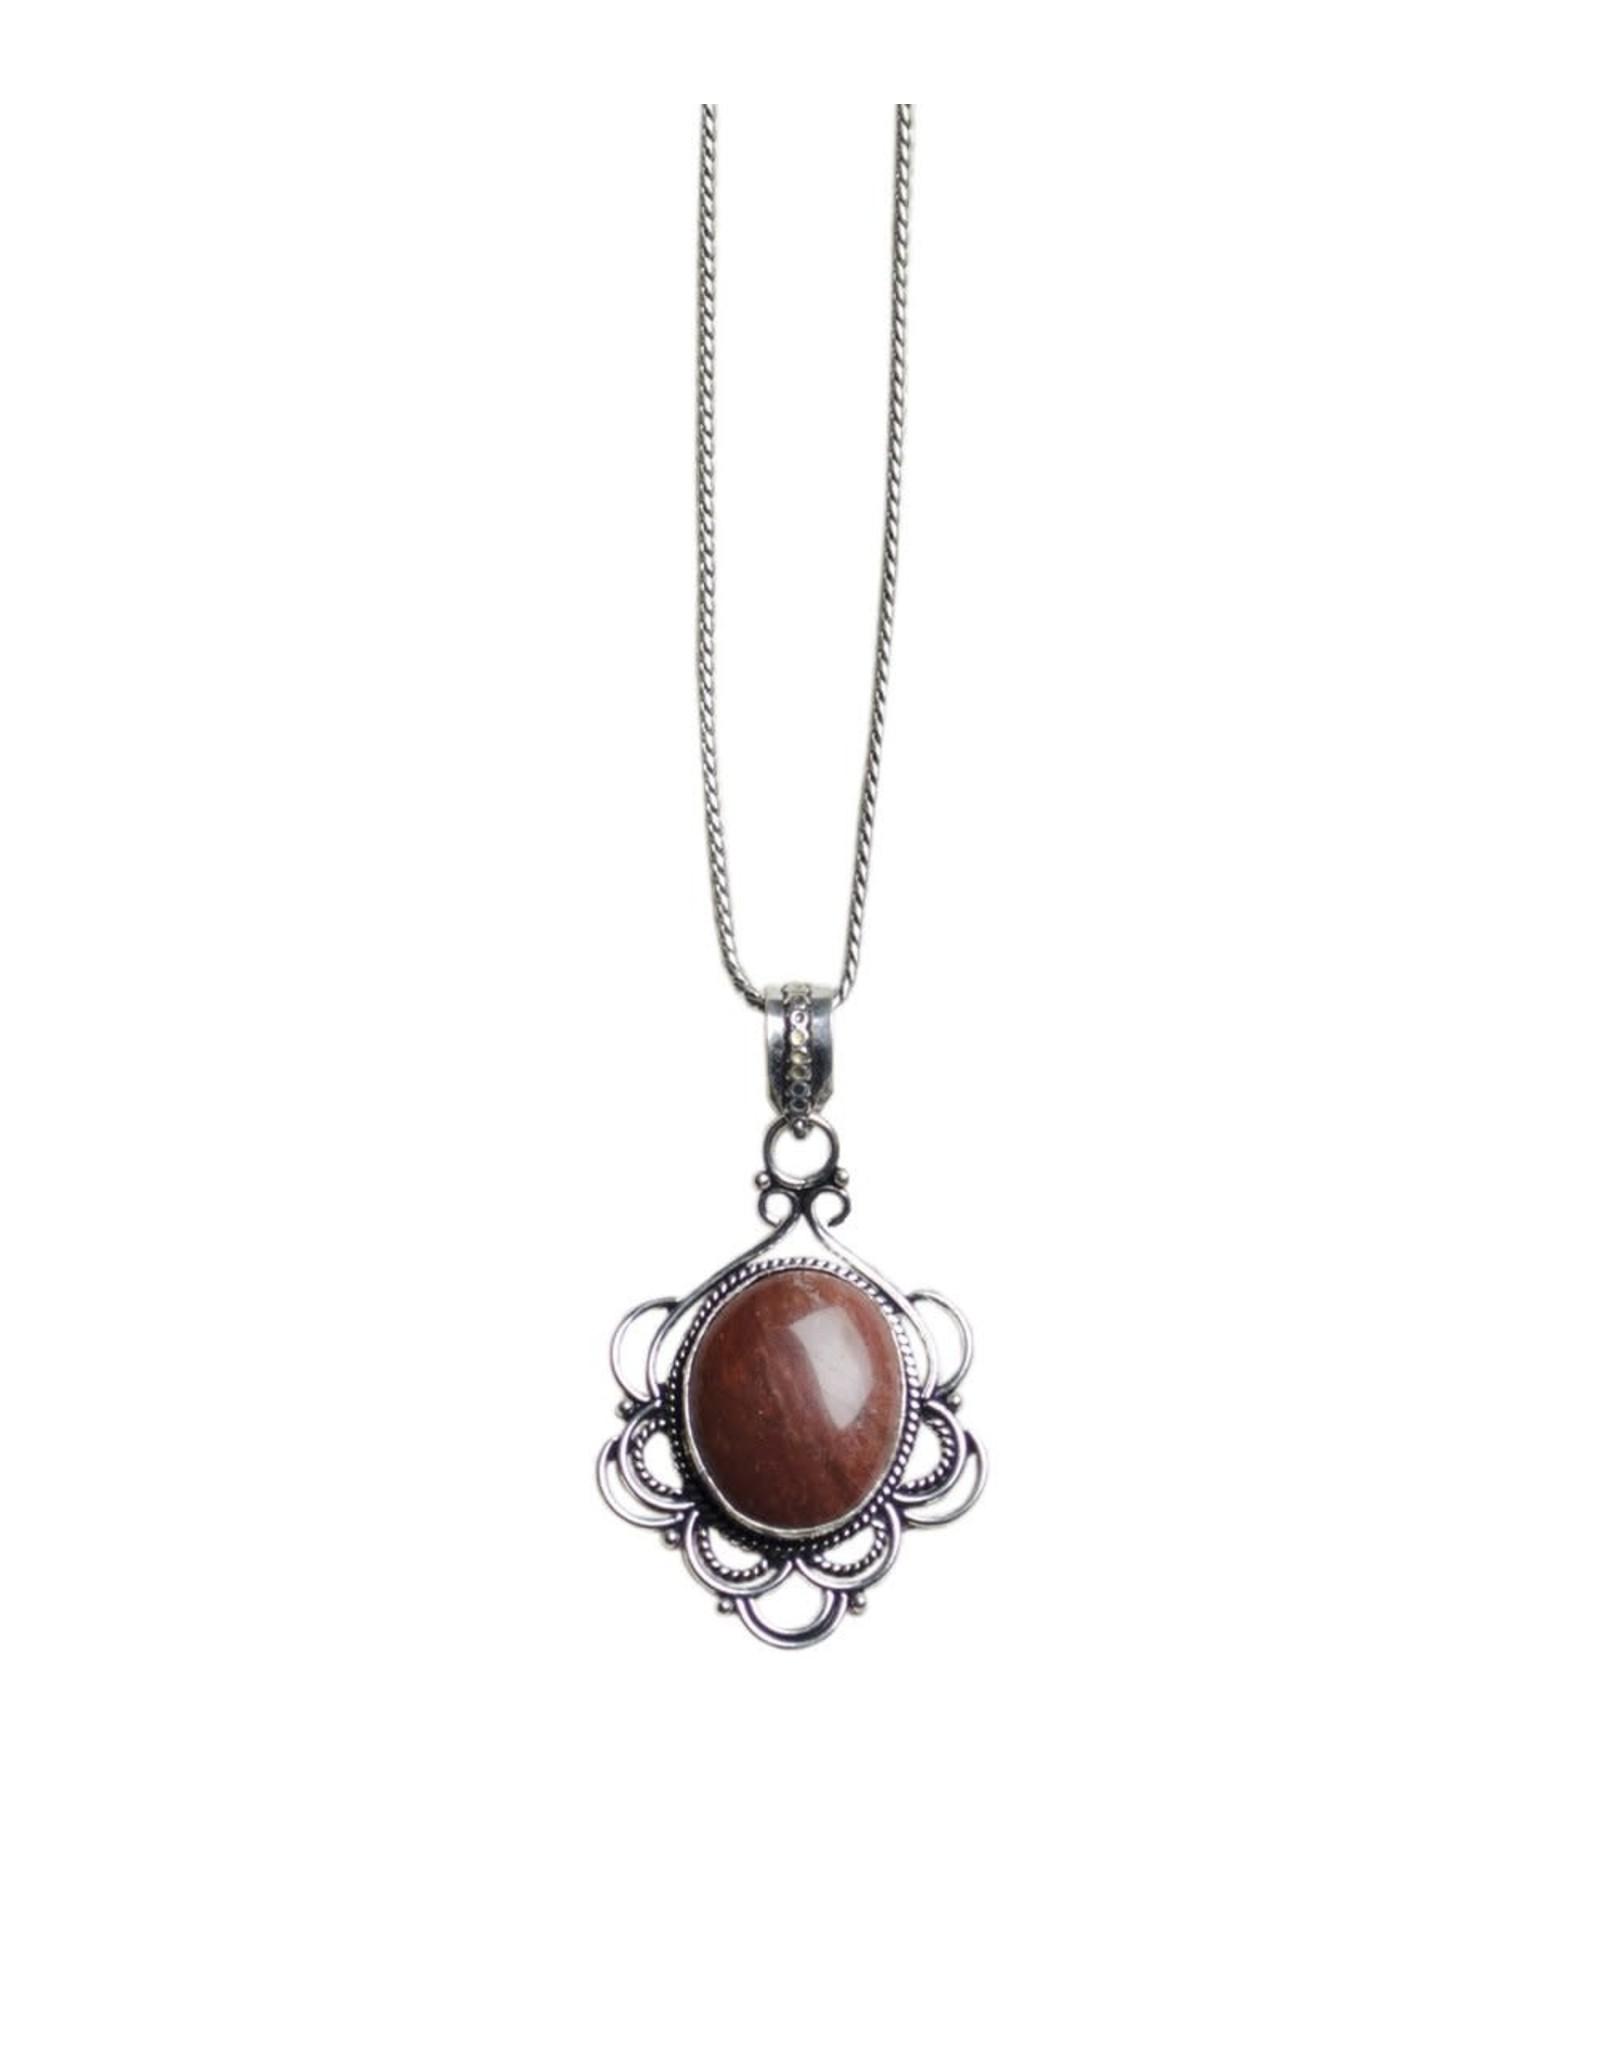 Matr Boomie Mod Pendant Necklace, assorted. India